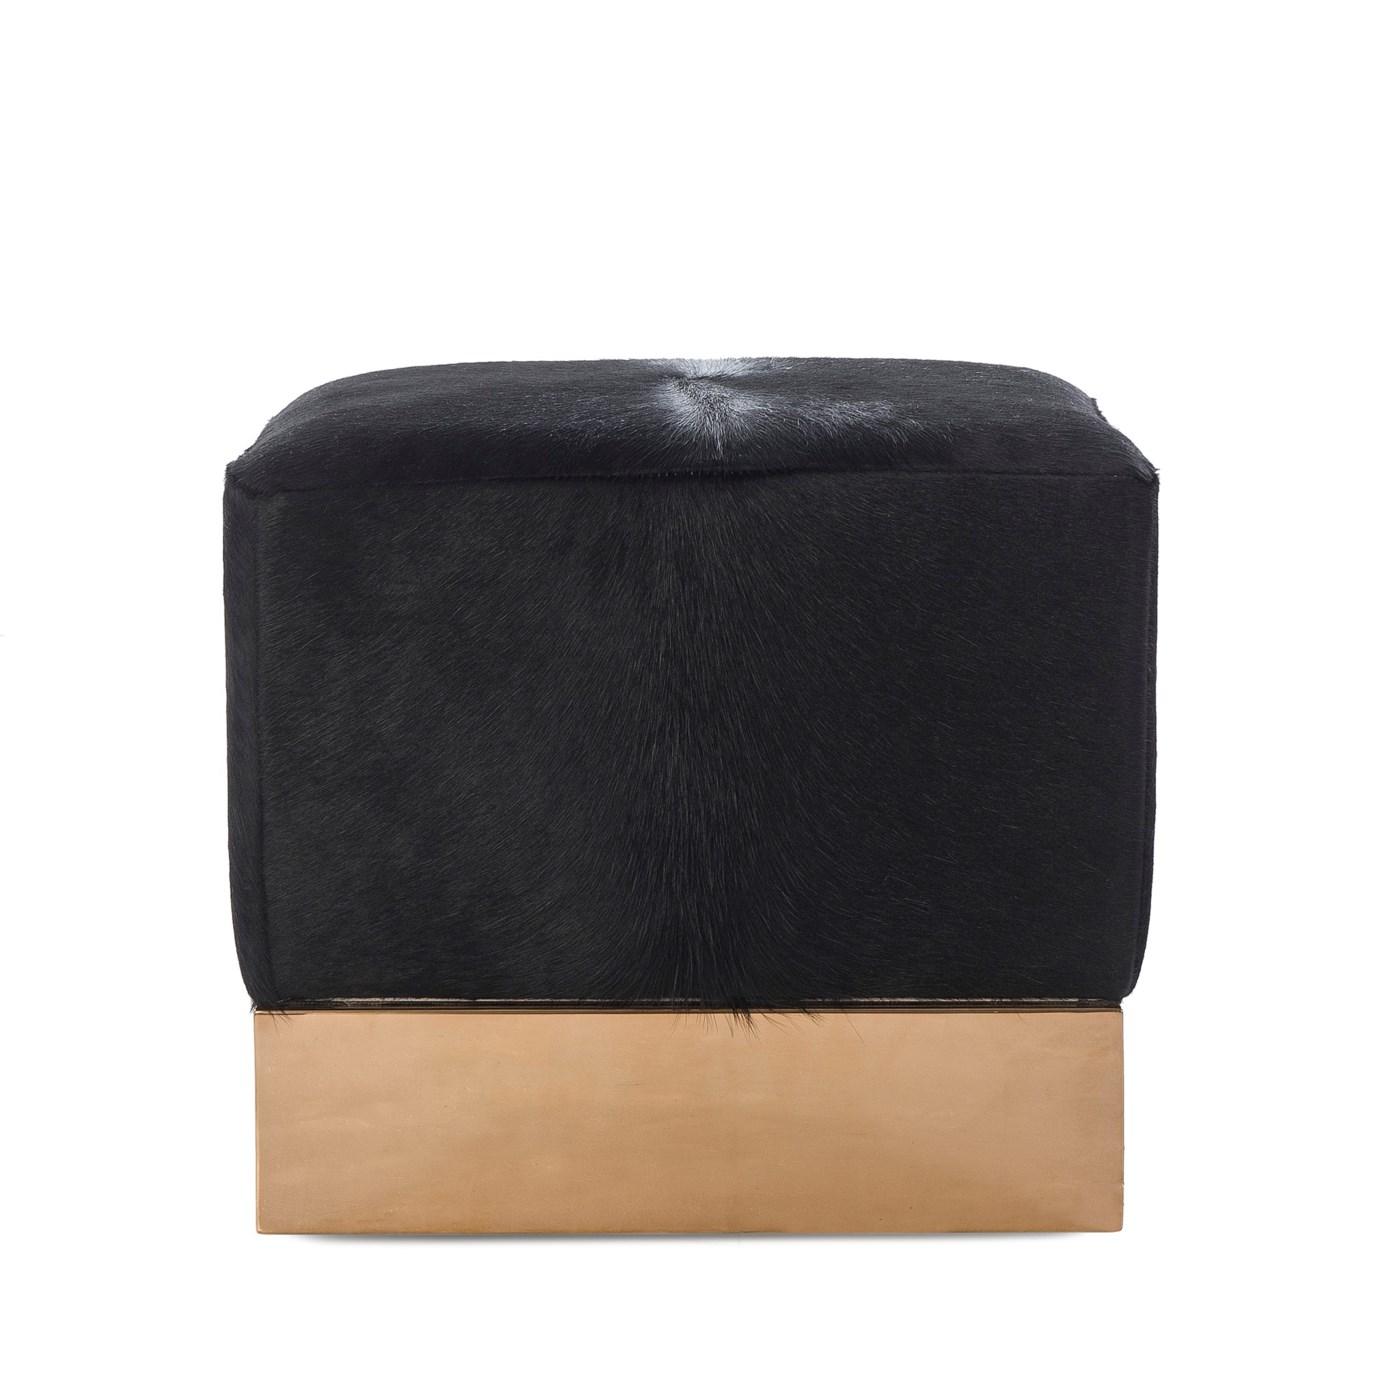 Morrison Ottoman - Square / Farrah Black Leather